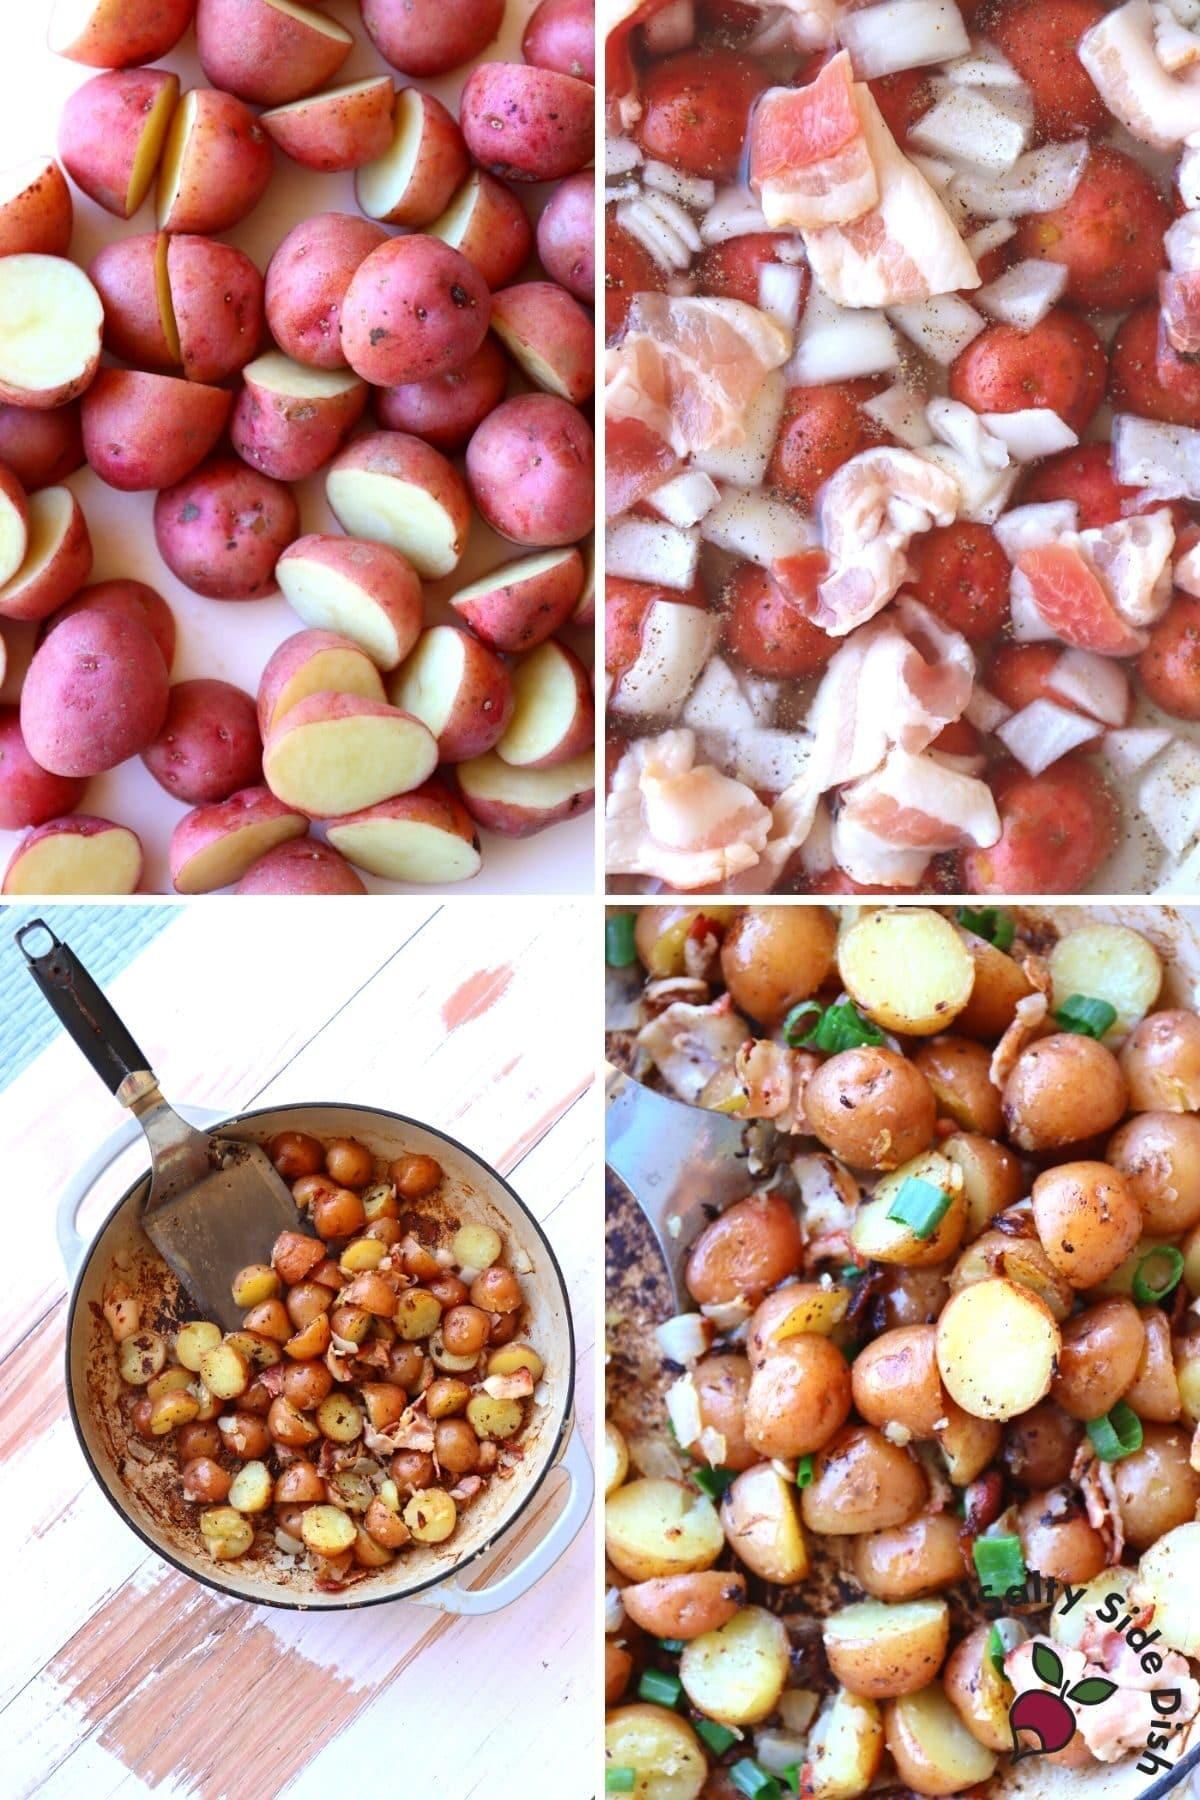 red potato and onions